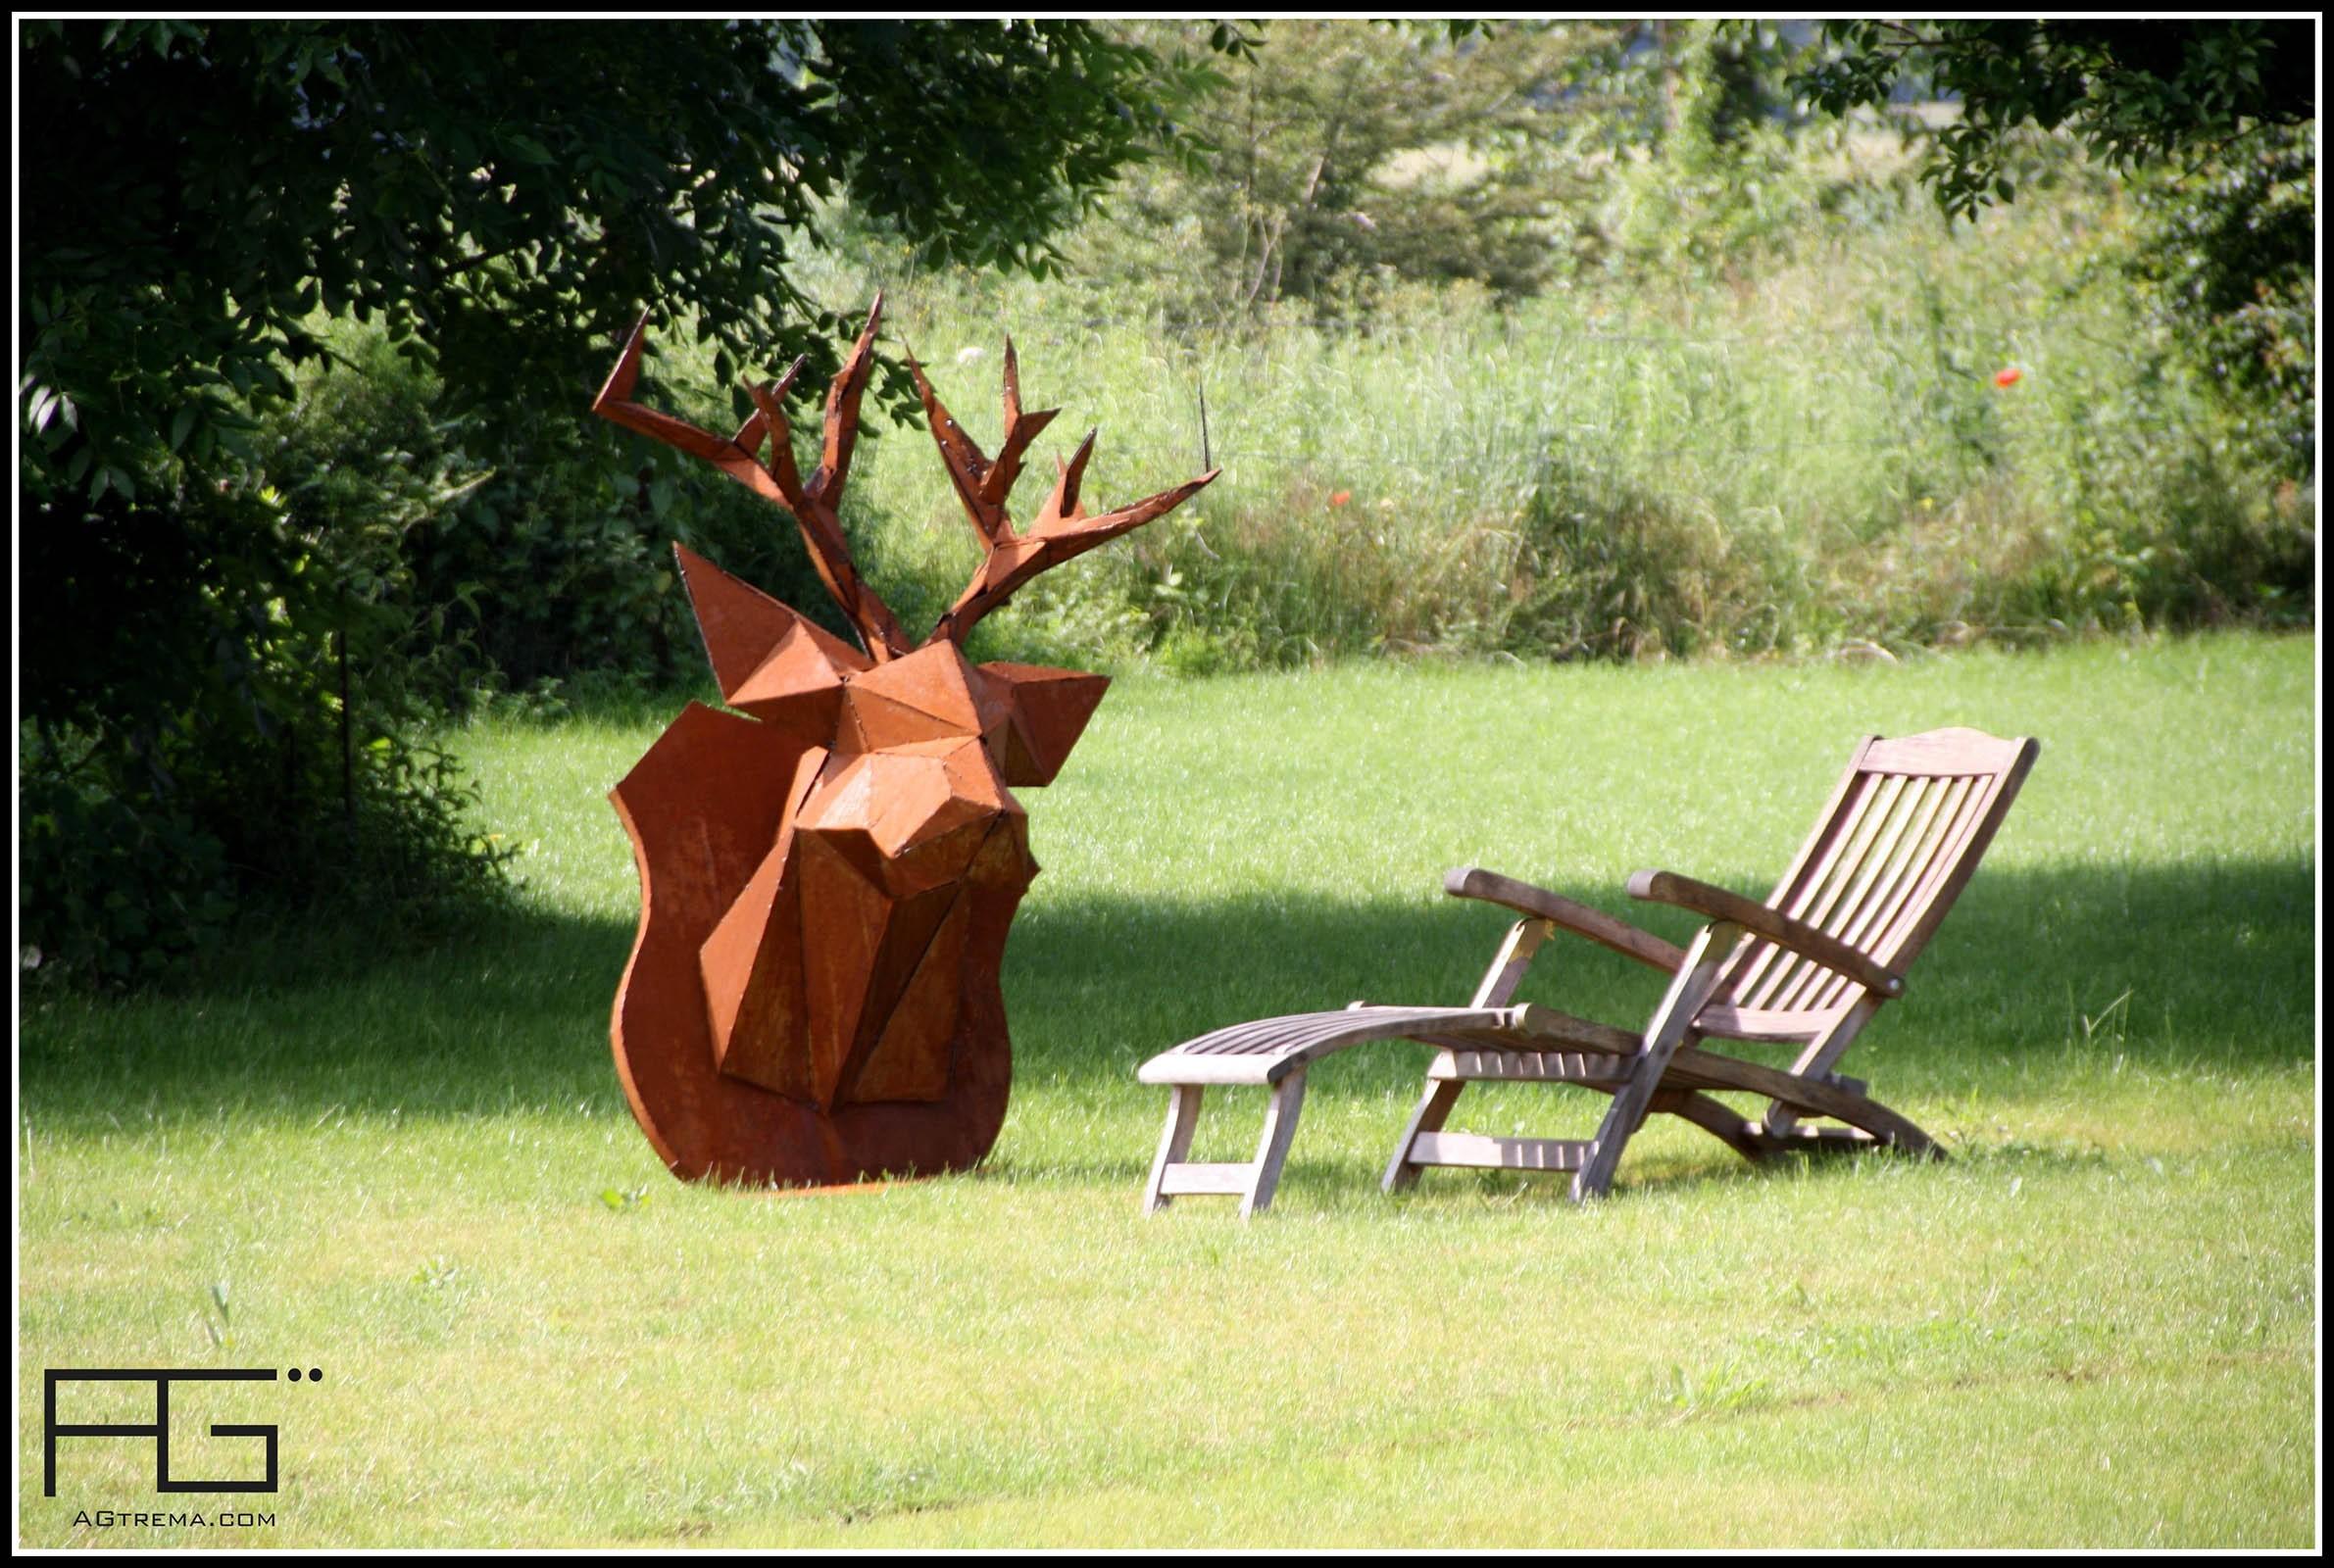 troph e tete de cerf origami en corten artisanat d 39 alsace agtrema. Black Bedroom Furniture Sets. Home Design Ideas